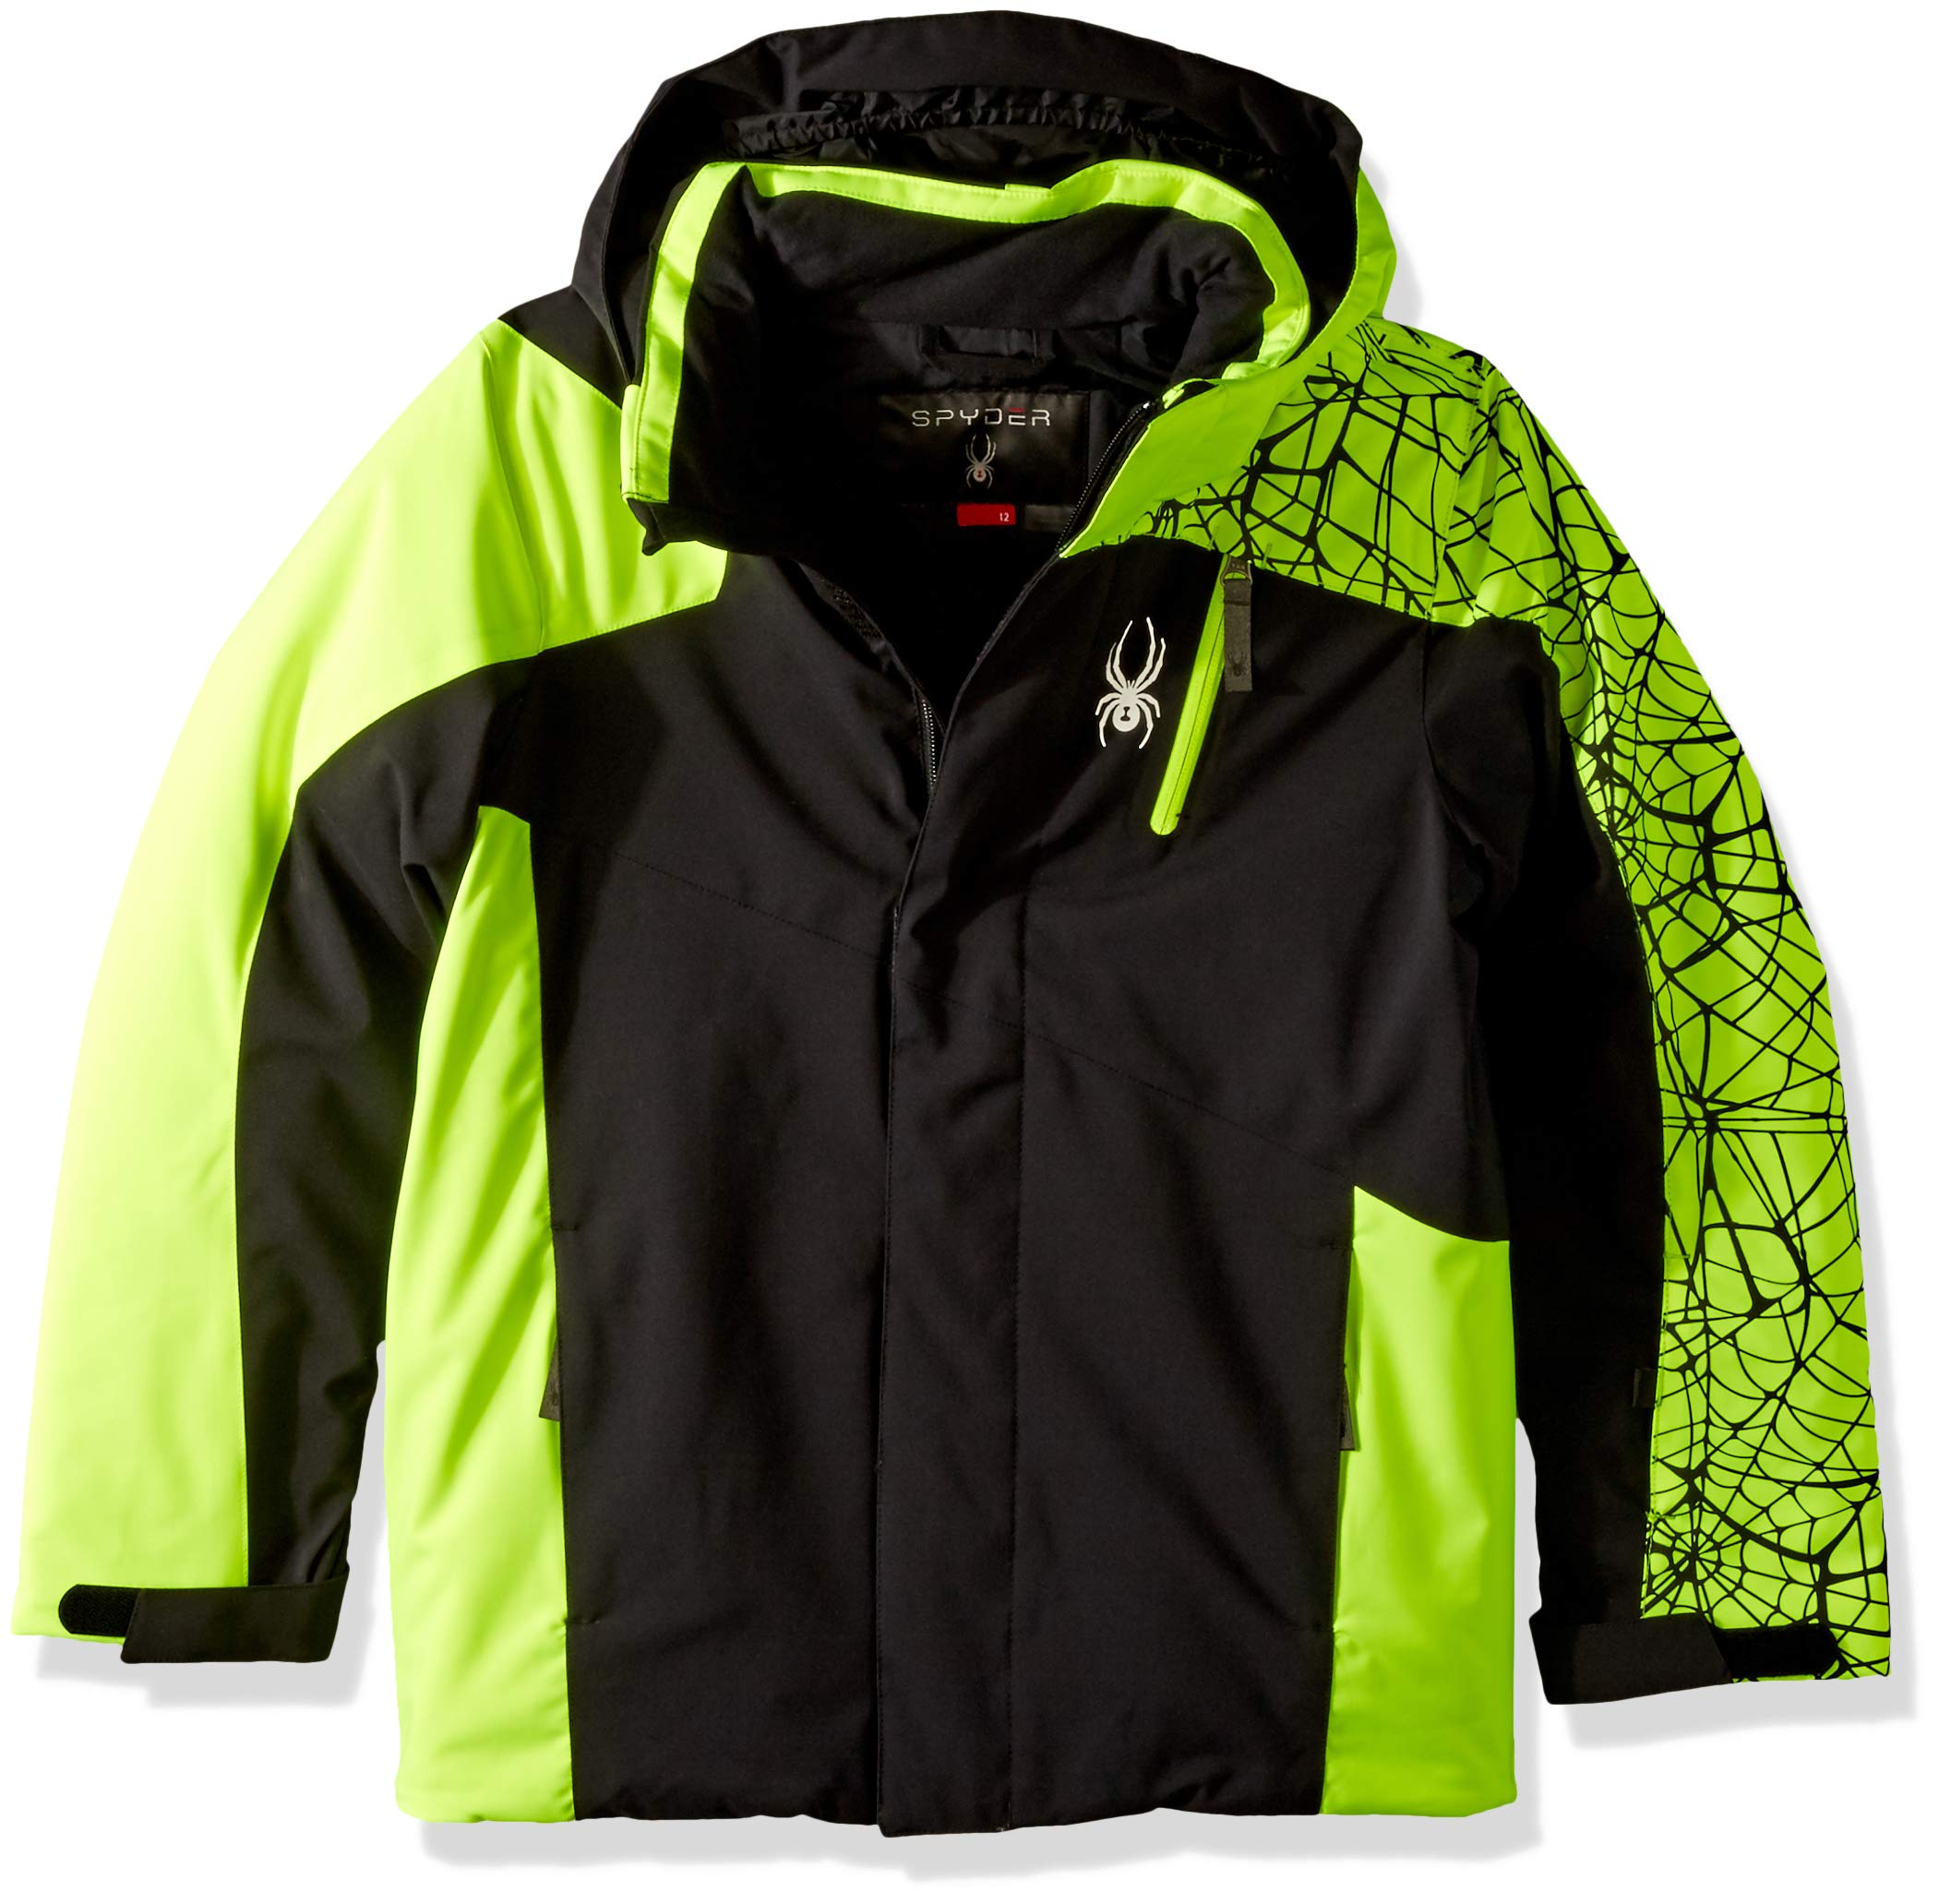 Spyder Boys' Guard Ski Jacket, Black/Bryte Yellow, Size 14